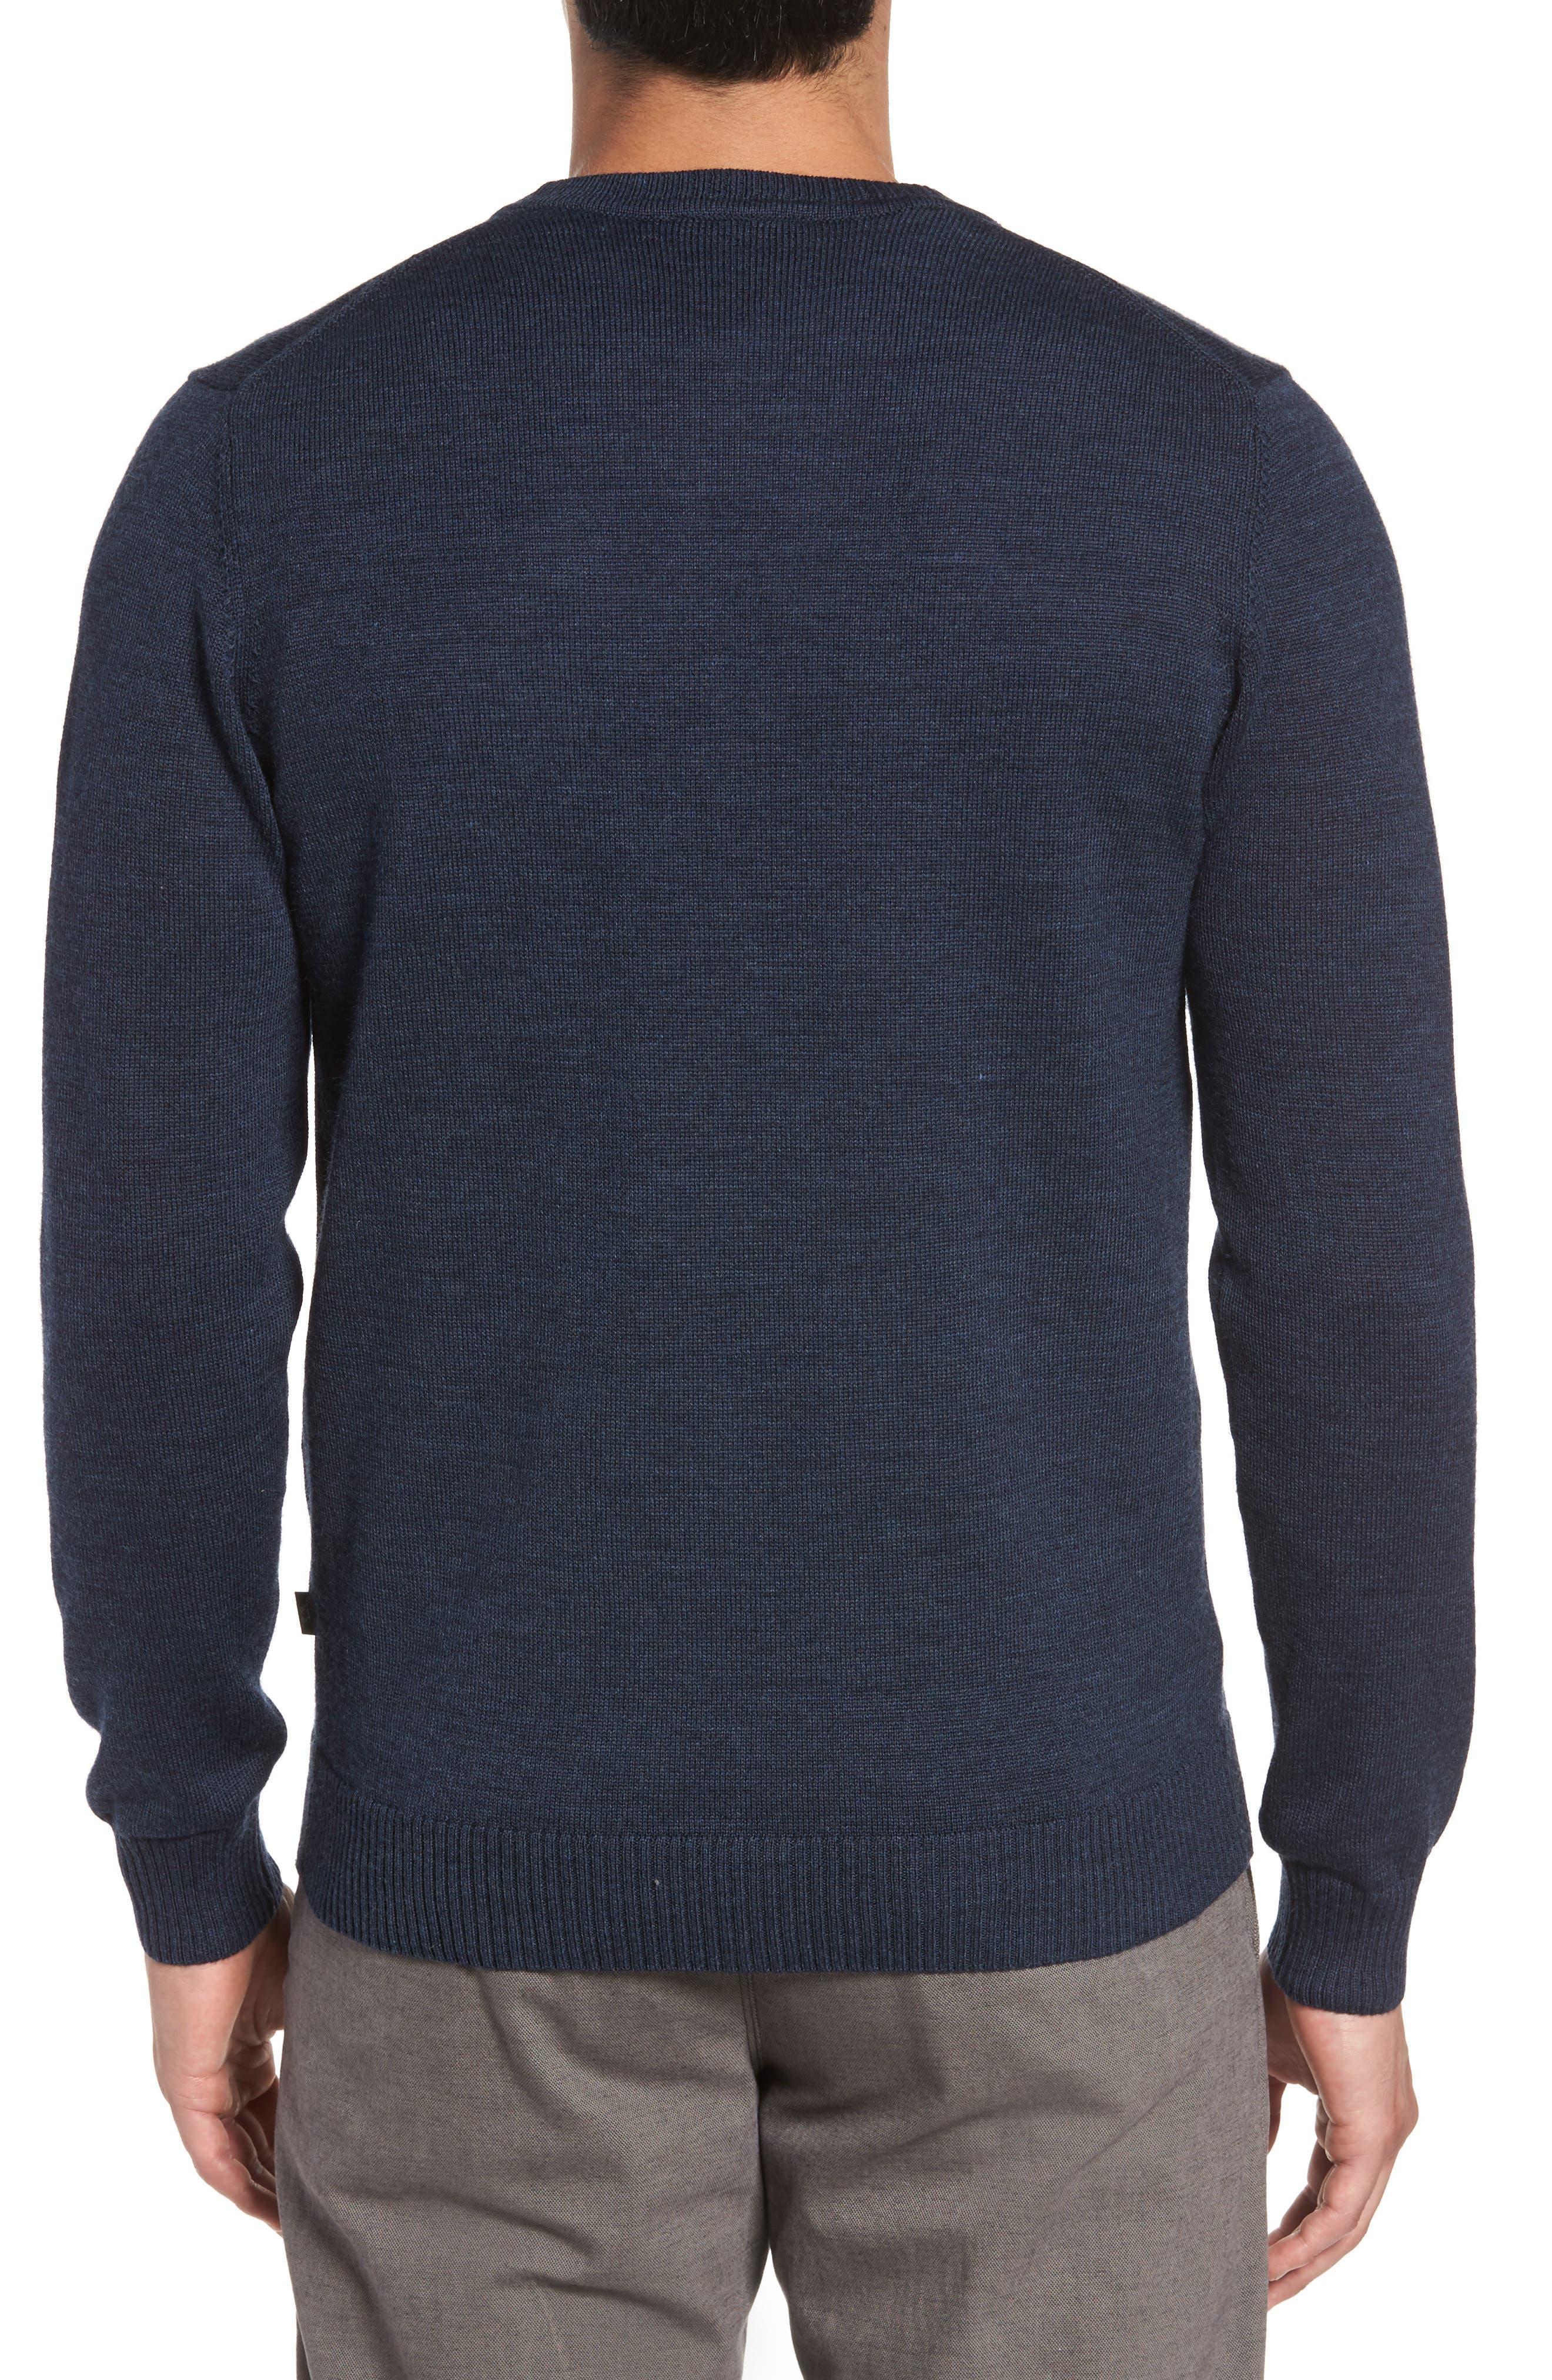 Bannockburn Mélange Merino Wool Sweater,                             Alternate thumbnail 2, color,                             401